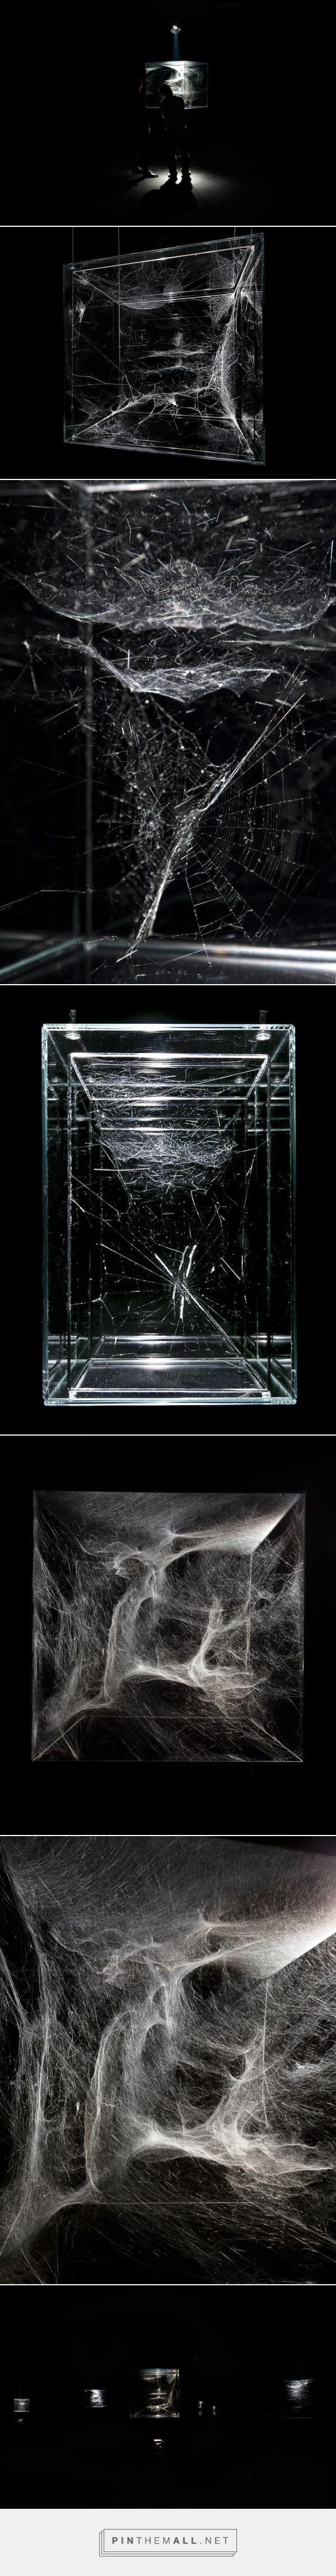 Tomás Saraceno's Spider Art Collaboration - created via http://pinthemall.net